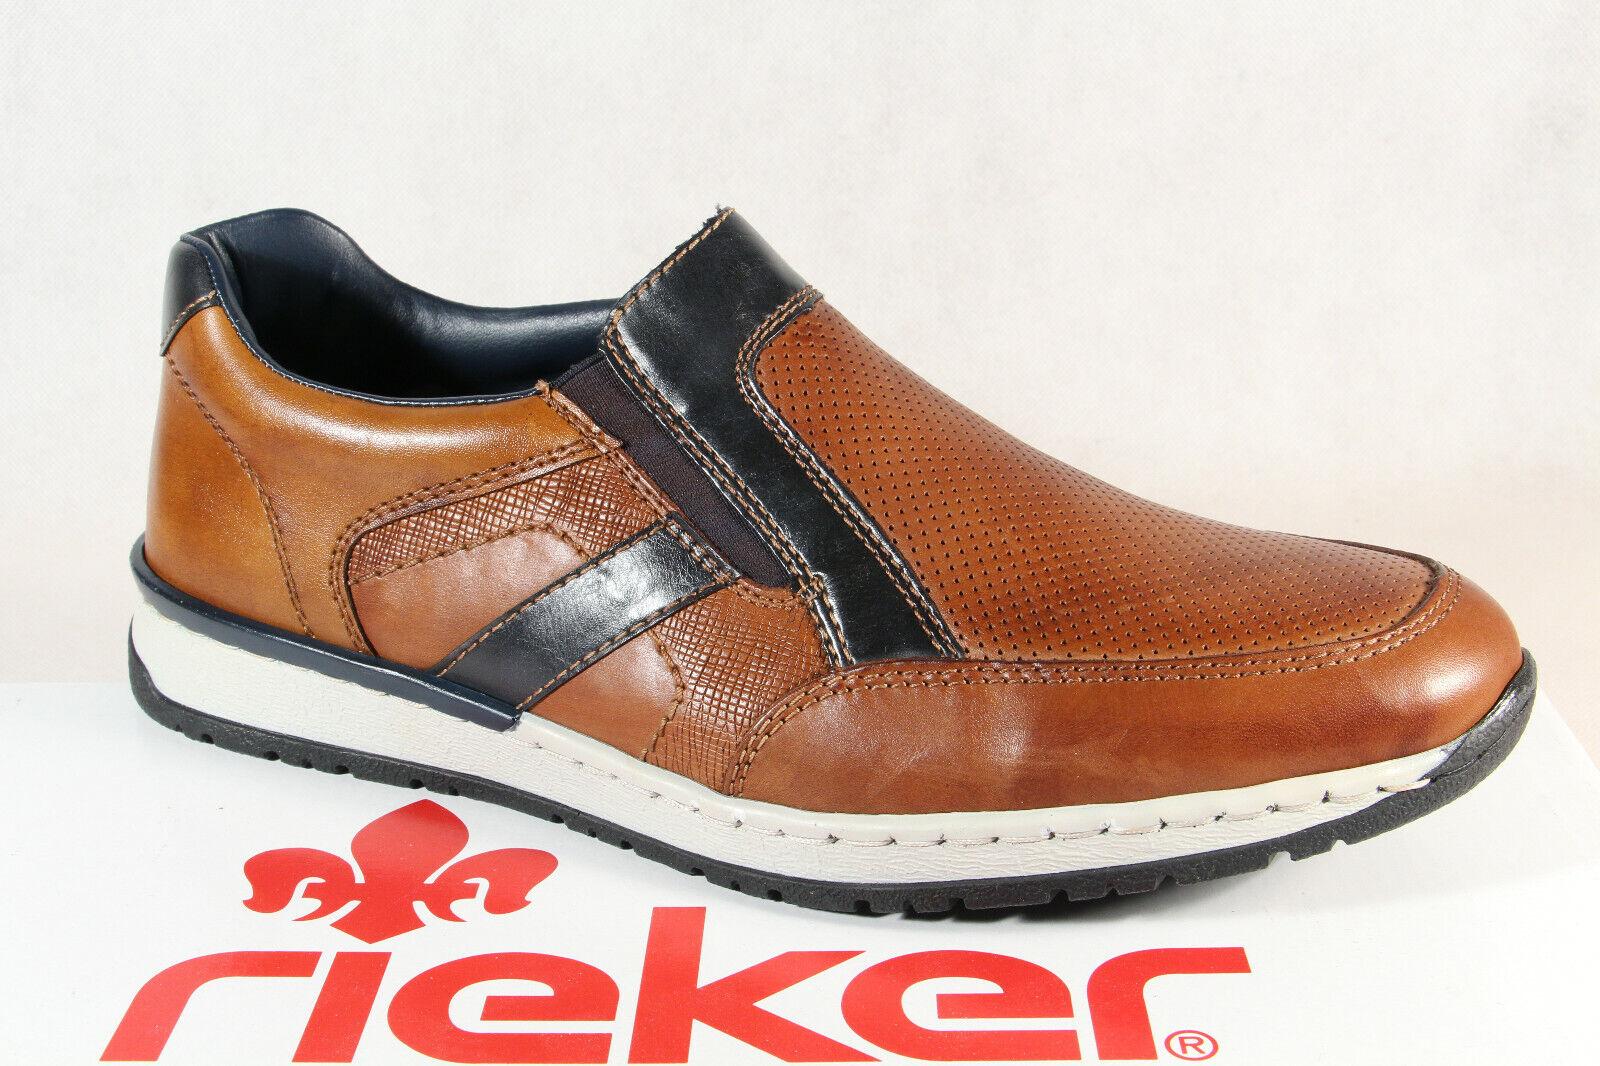 Rieker Scarpe Basse Morbide scarpe da ginnastica Marroneei B5160 Nuovo